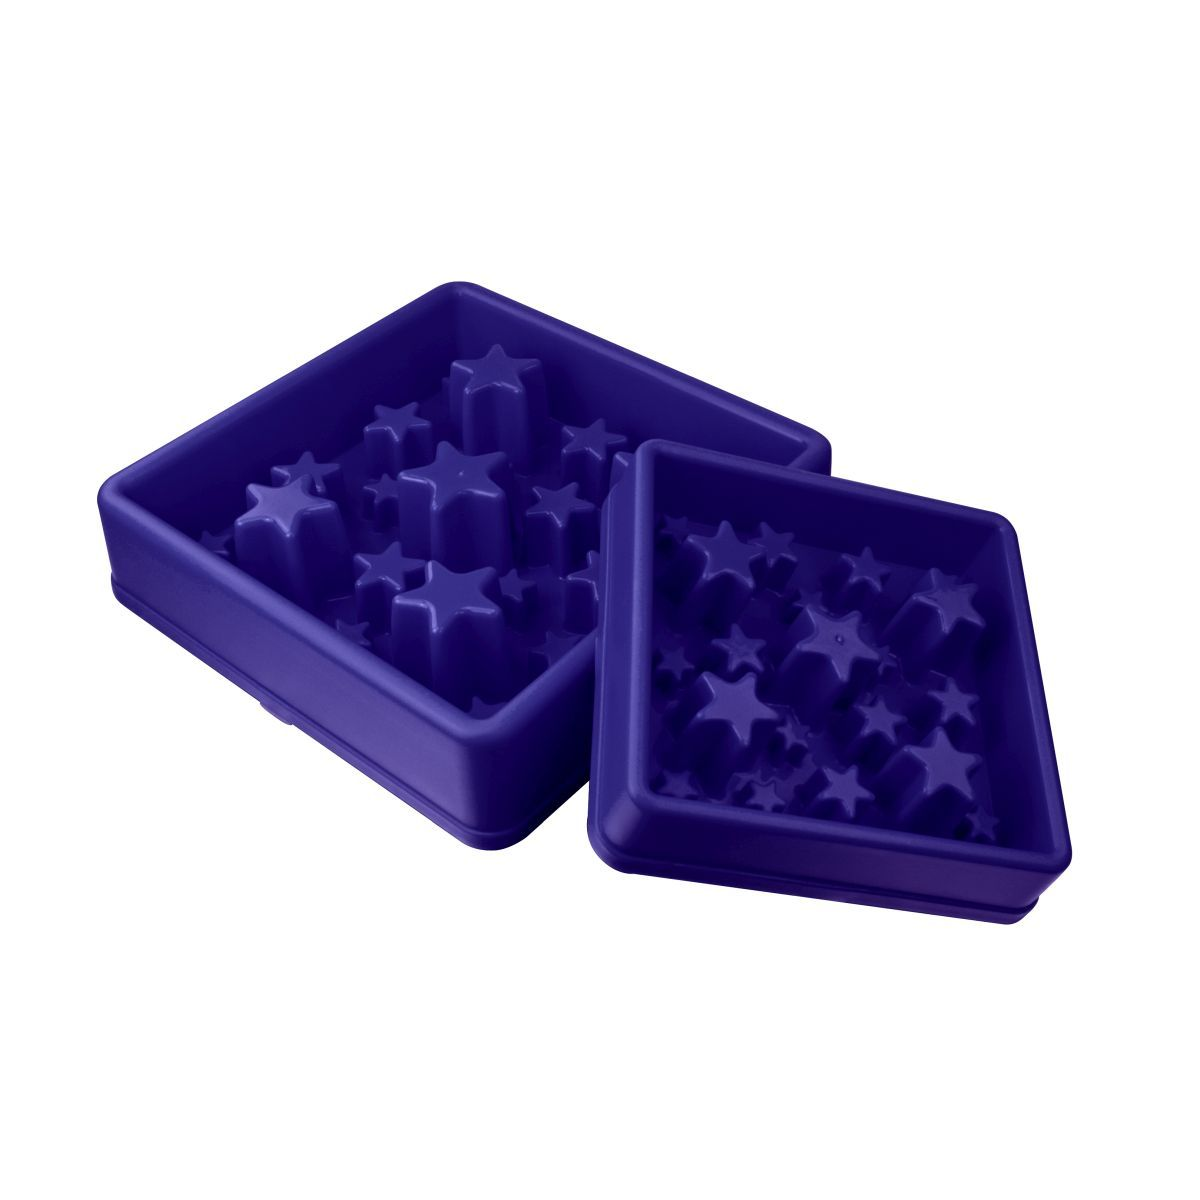 EAT SLOW STAR BLAUW SM N 00001